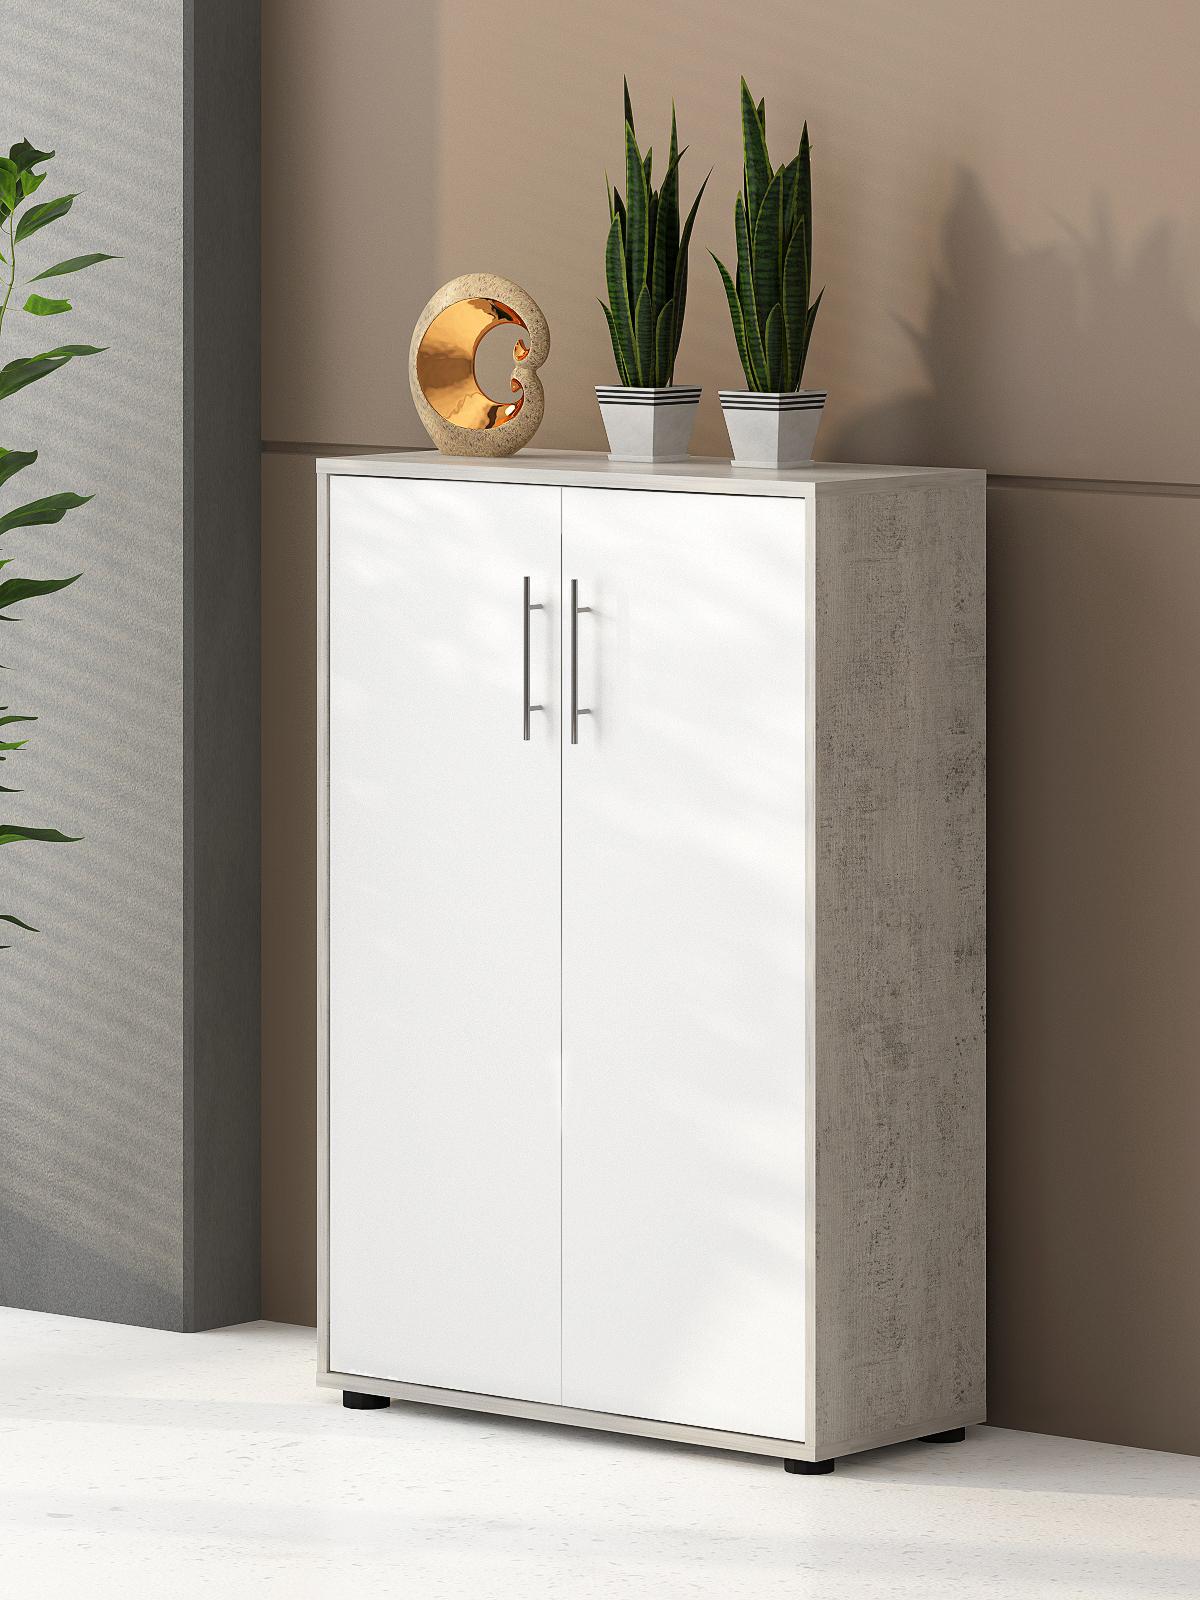 6-teilige Büro-Kombination Omega Beton & Weiß matt Dekor